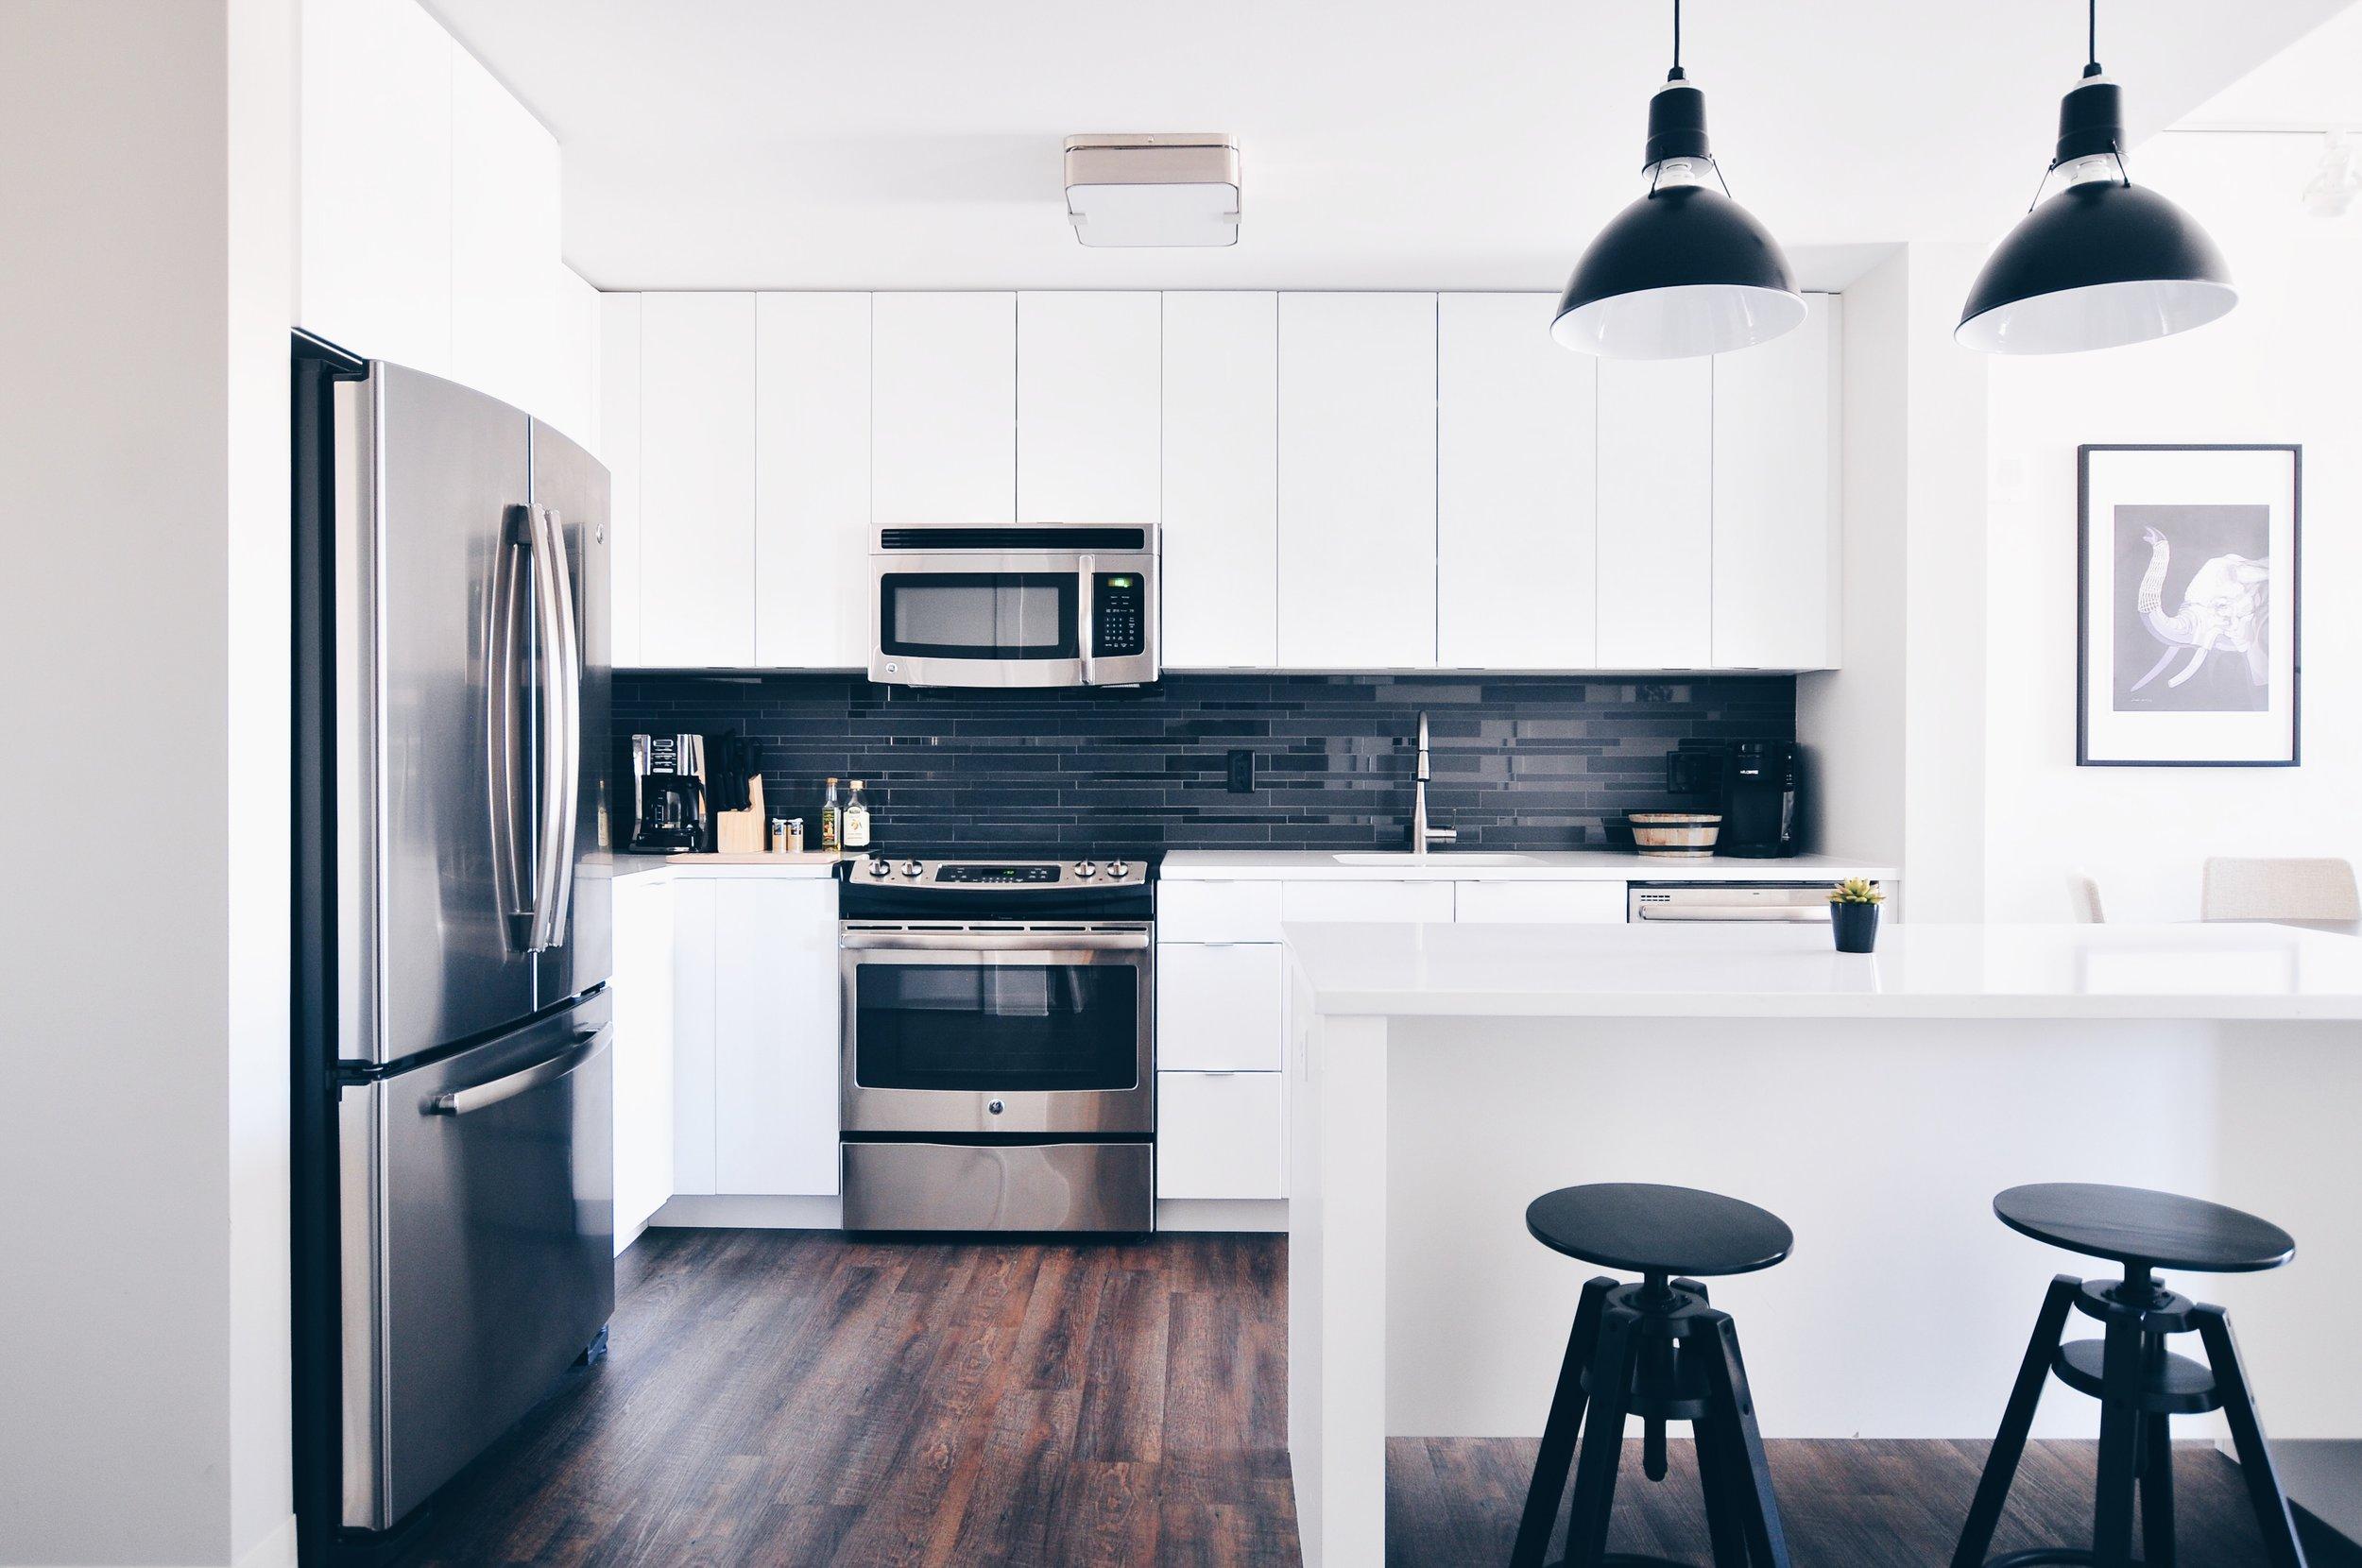 Kitchen Backsplash The Malibu Life Team Real Estate Compass